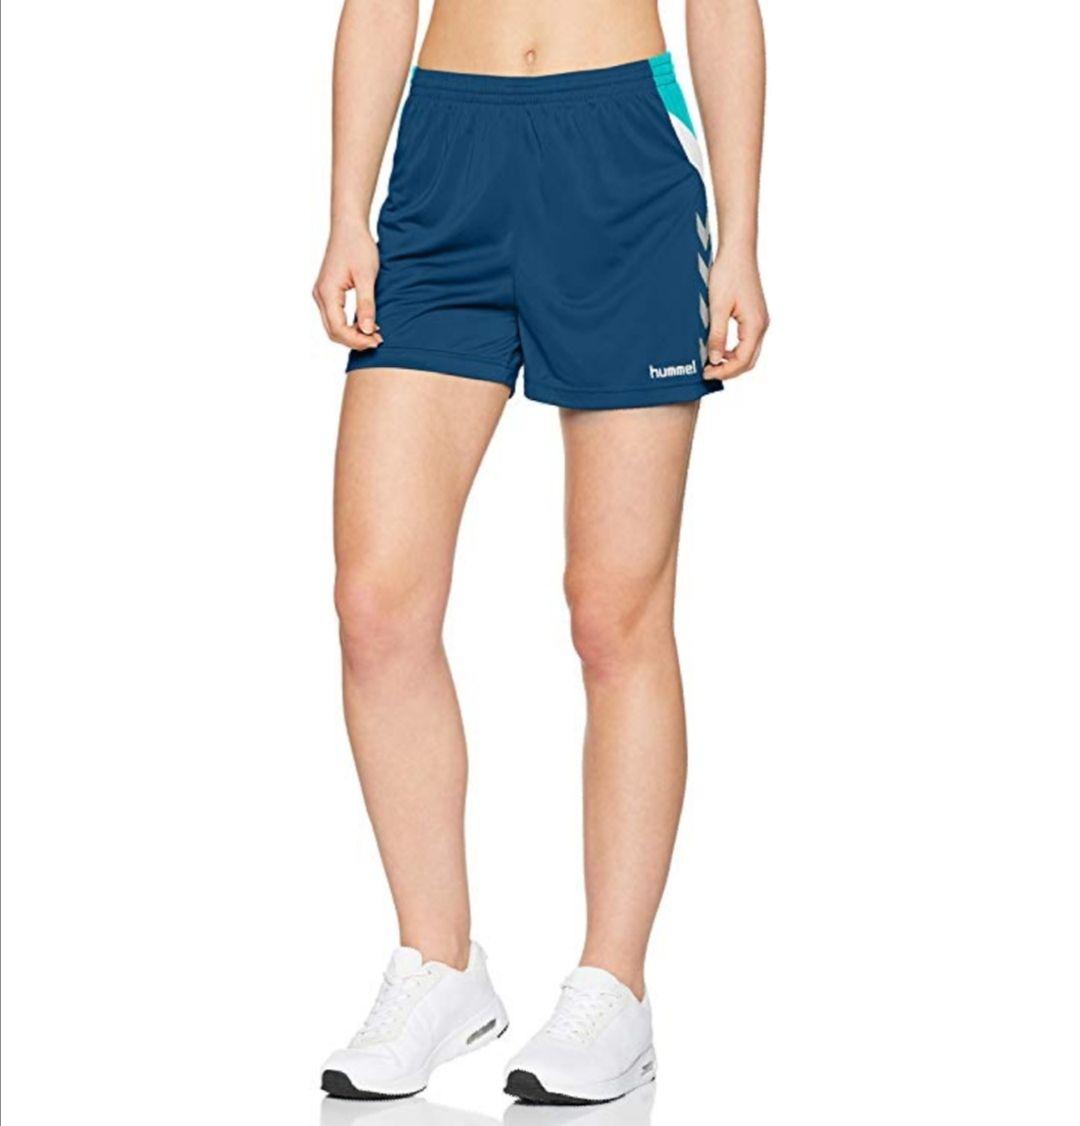 Hummel. Pantalones cortos de mujer